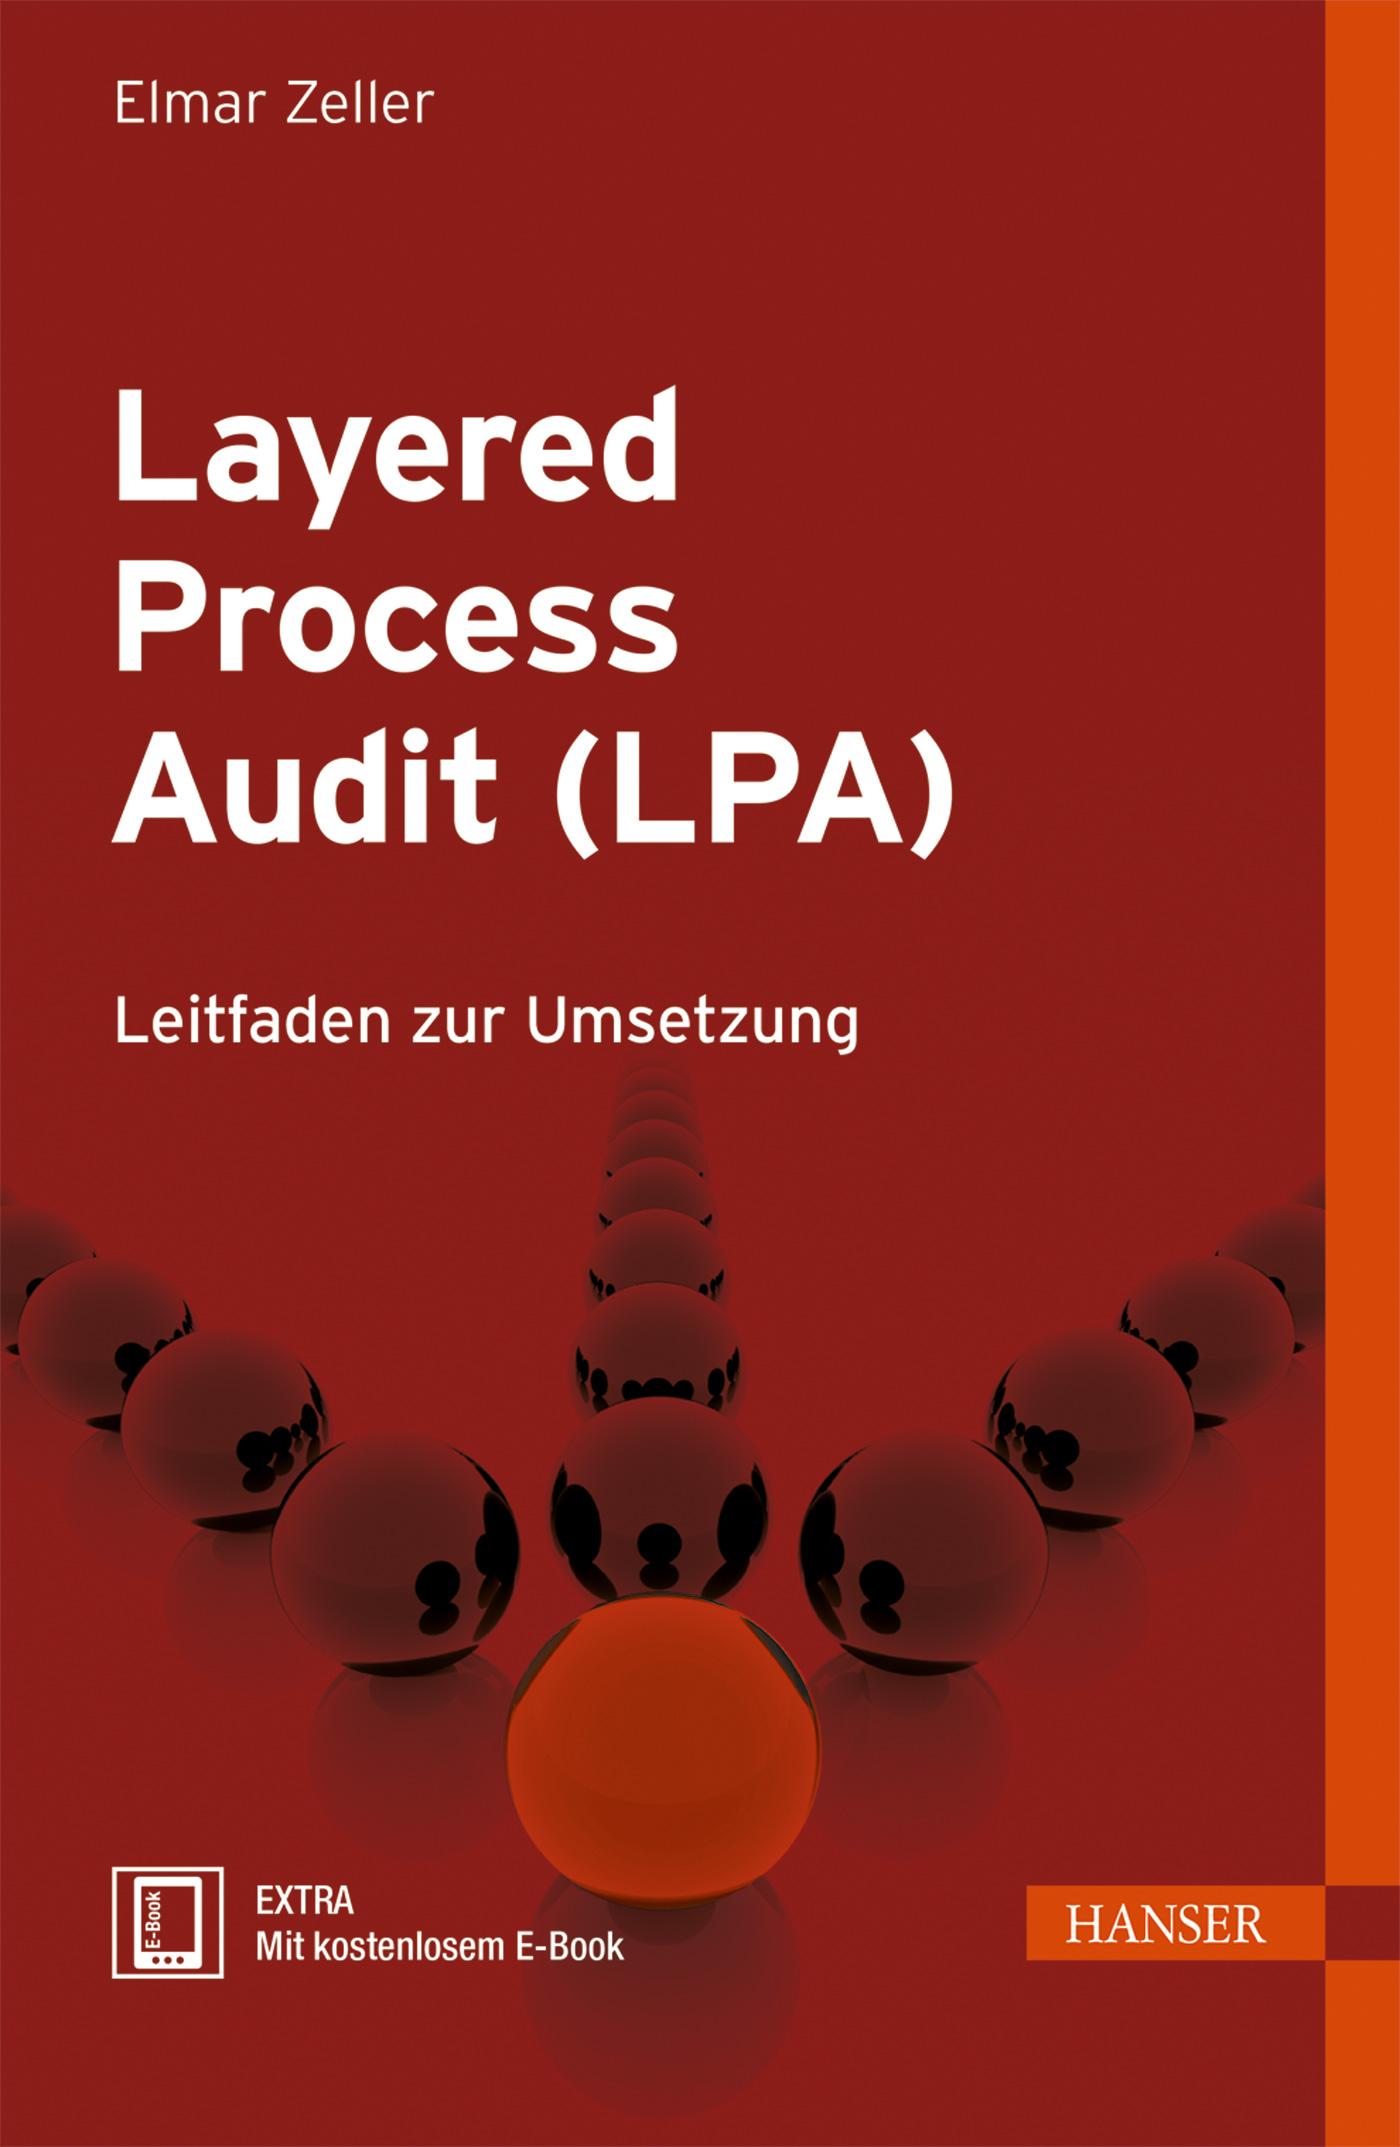 Zeller, Layered Process Audit (LPA), 978-3-446-43790-6